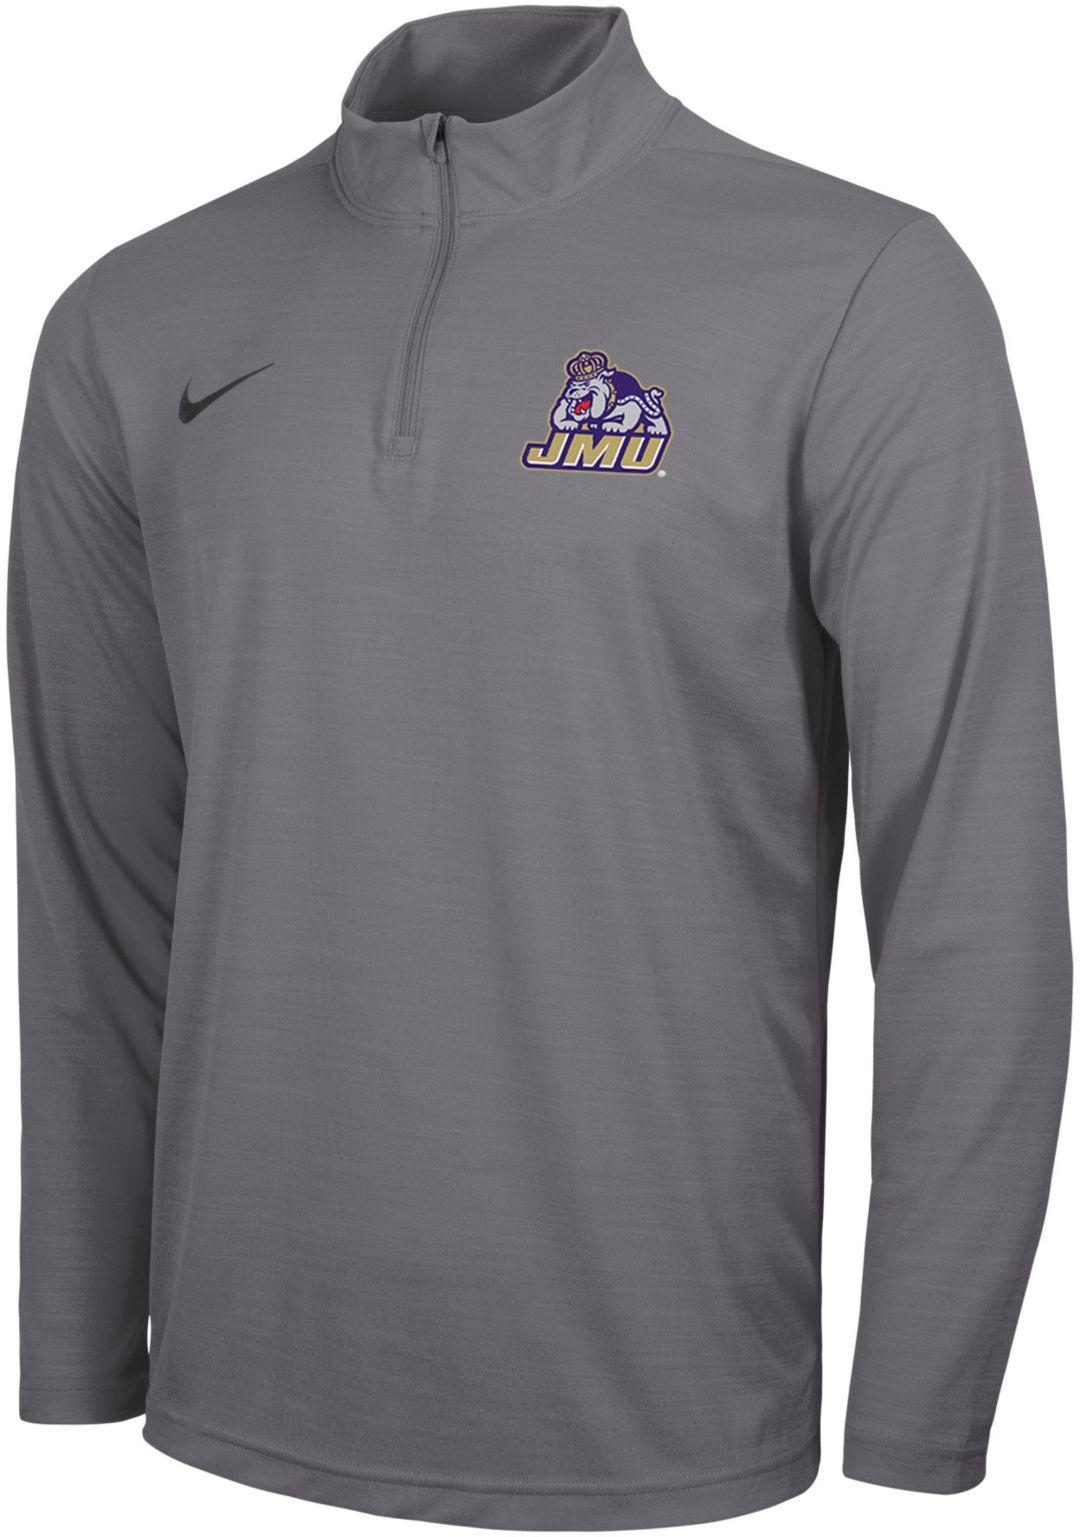 quality design 9fee8 412bb Nike Men's James Madison Dukes Grey Intensity Quarter-Zip Shirt